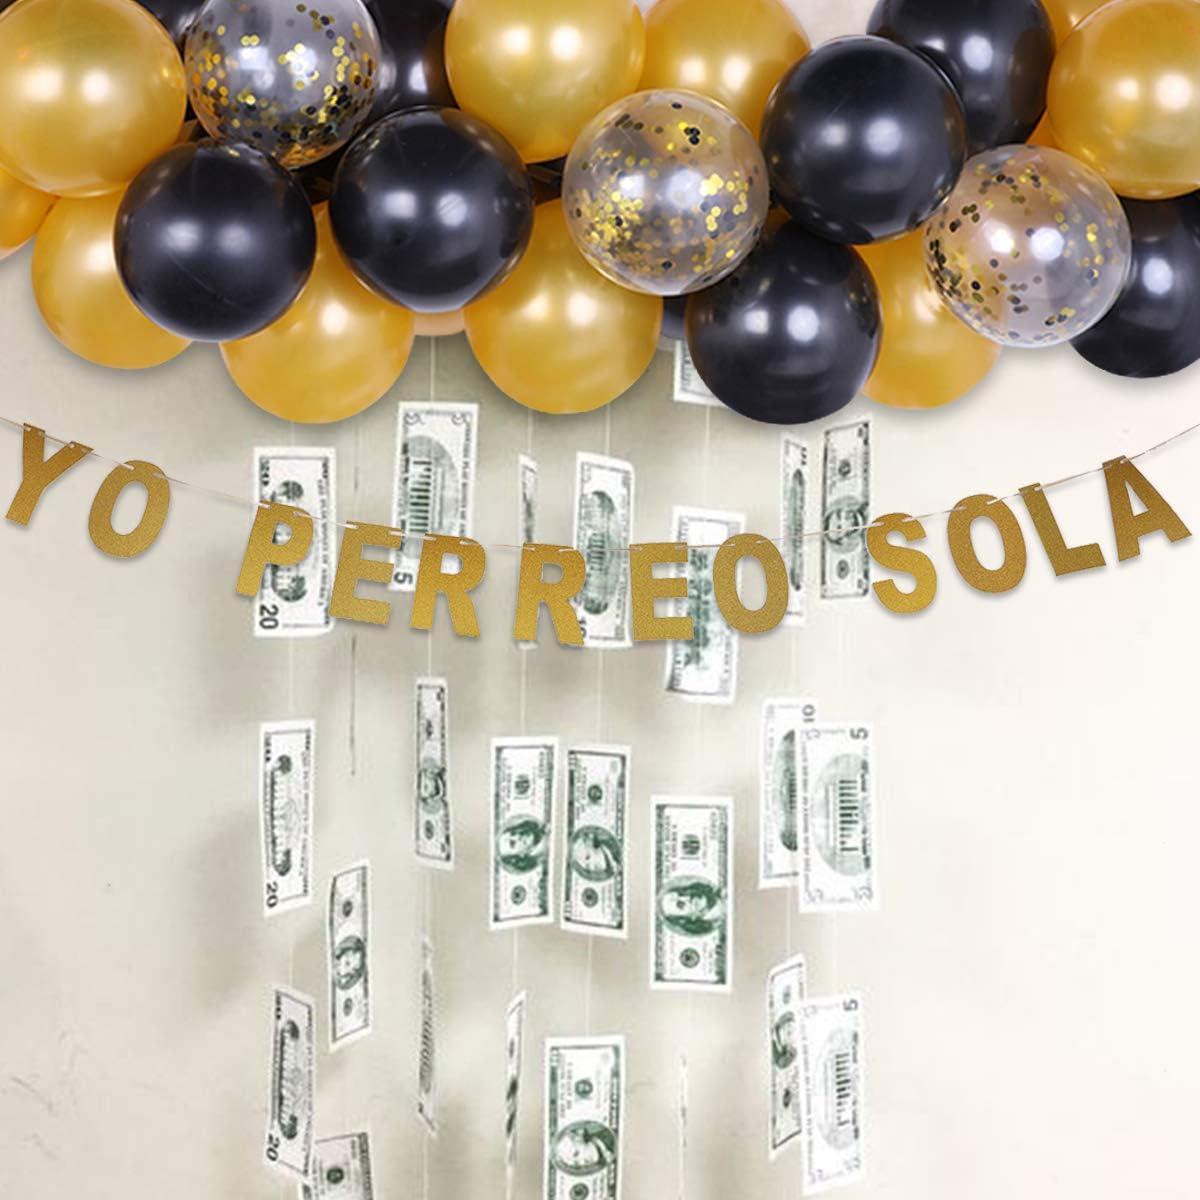 Conejo Malo  Party Decorations Bad Bunny Party Decorations Bad Bunny Party Supplies customized Yo Perreo Sola banner Bad Bunny Balloons